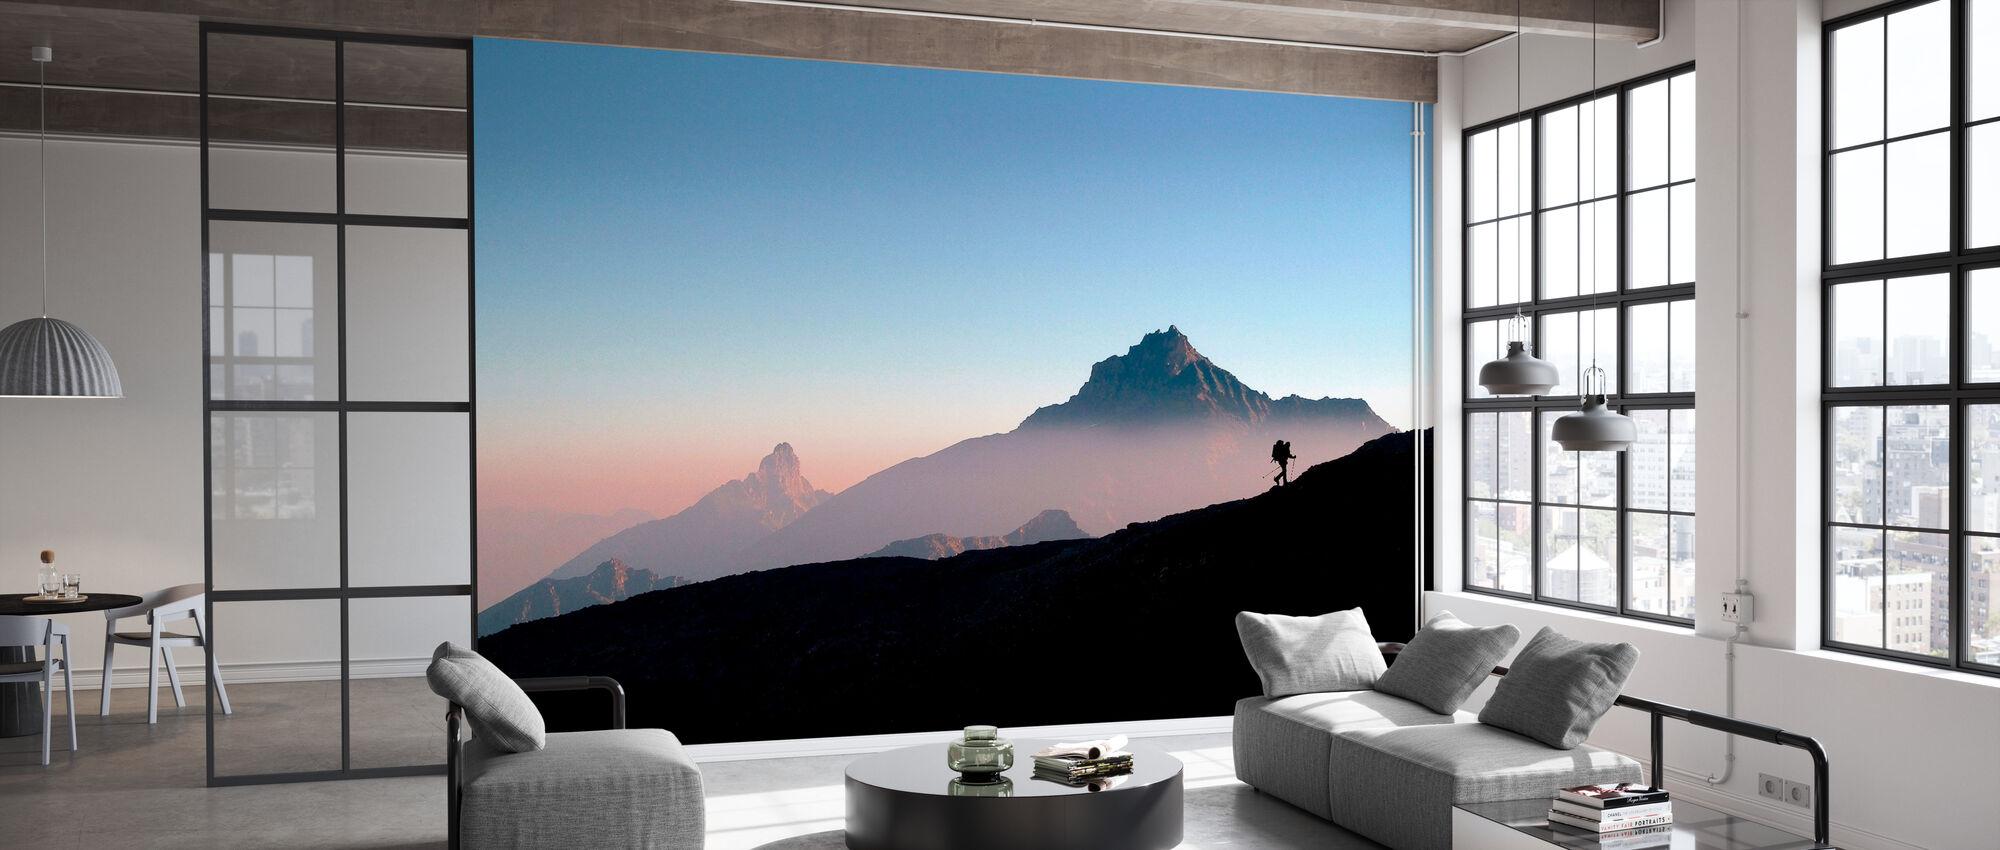 Gran Paradiso National Park - Wallpaper - Office